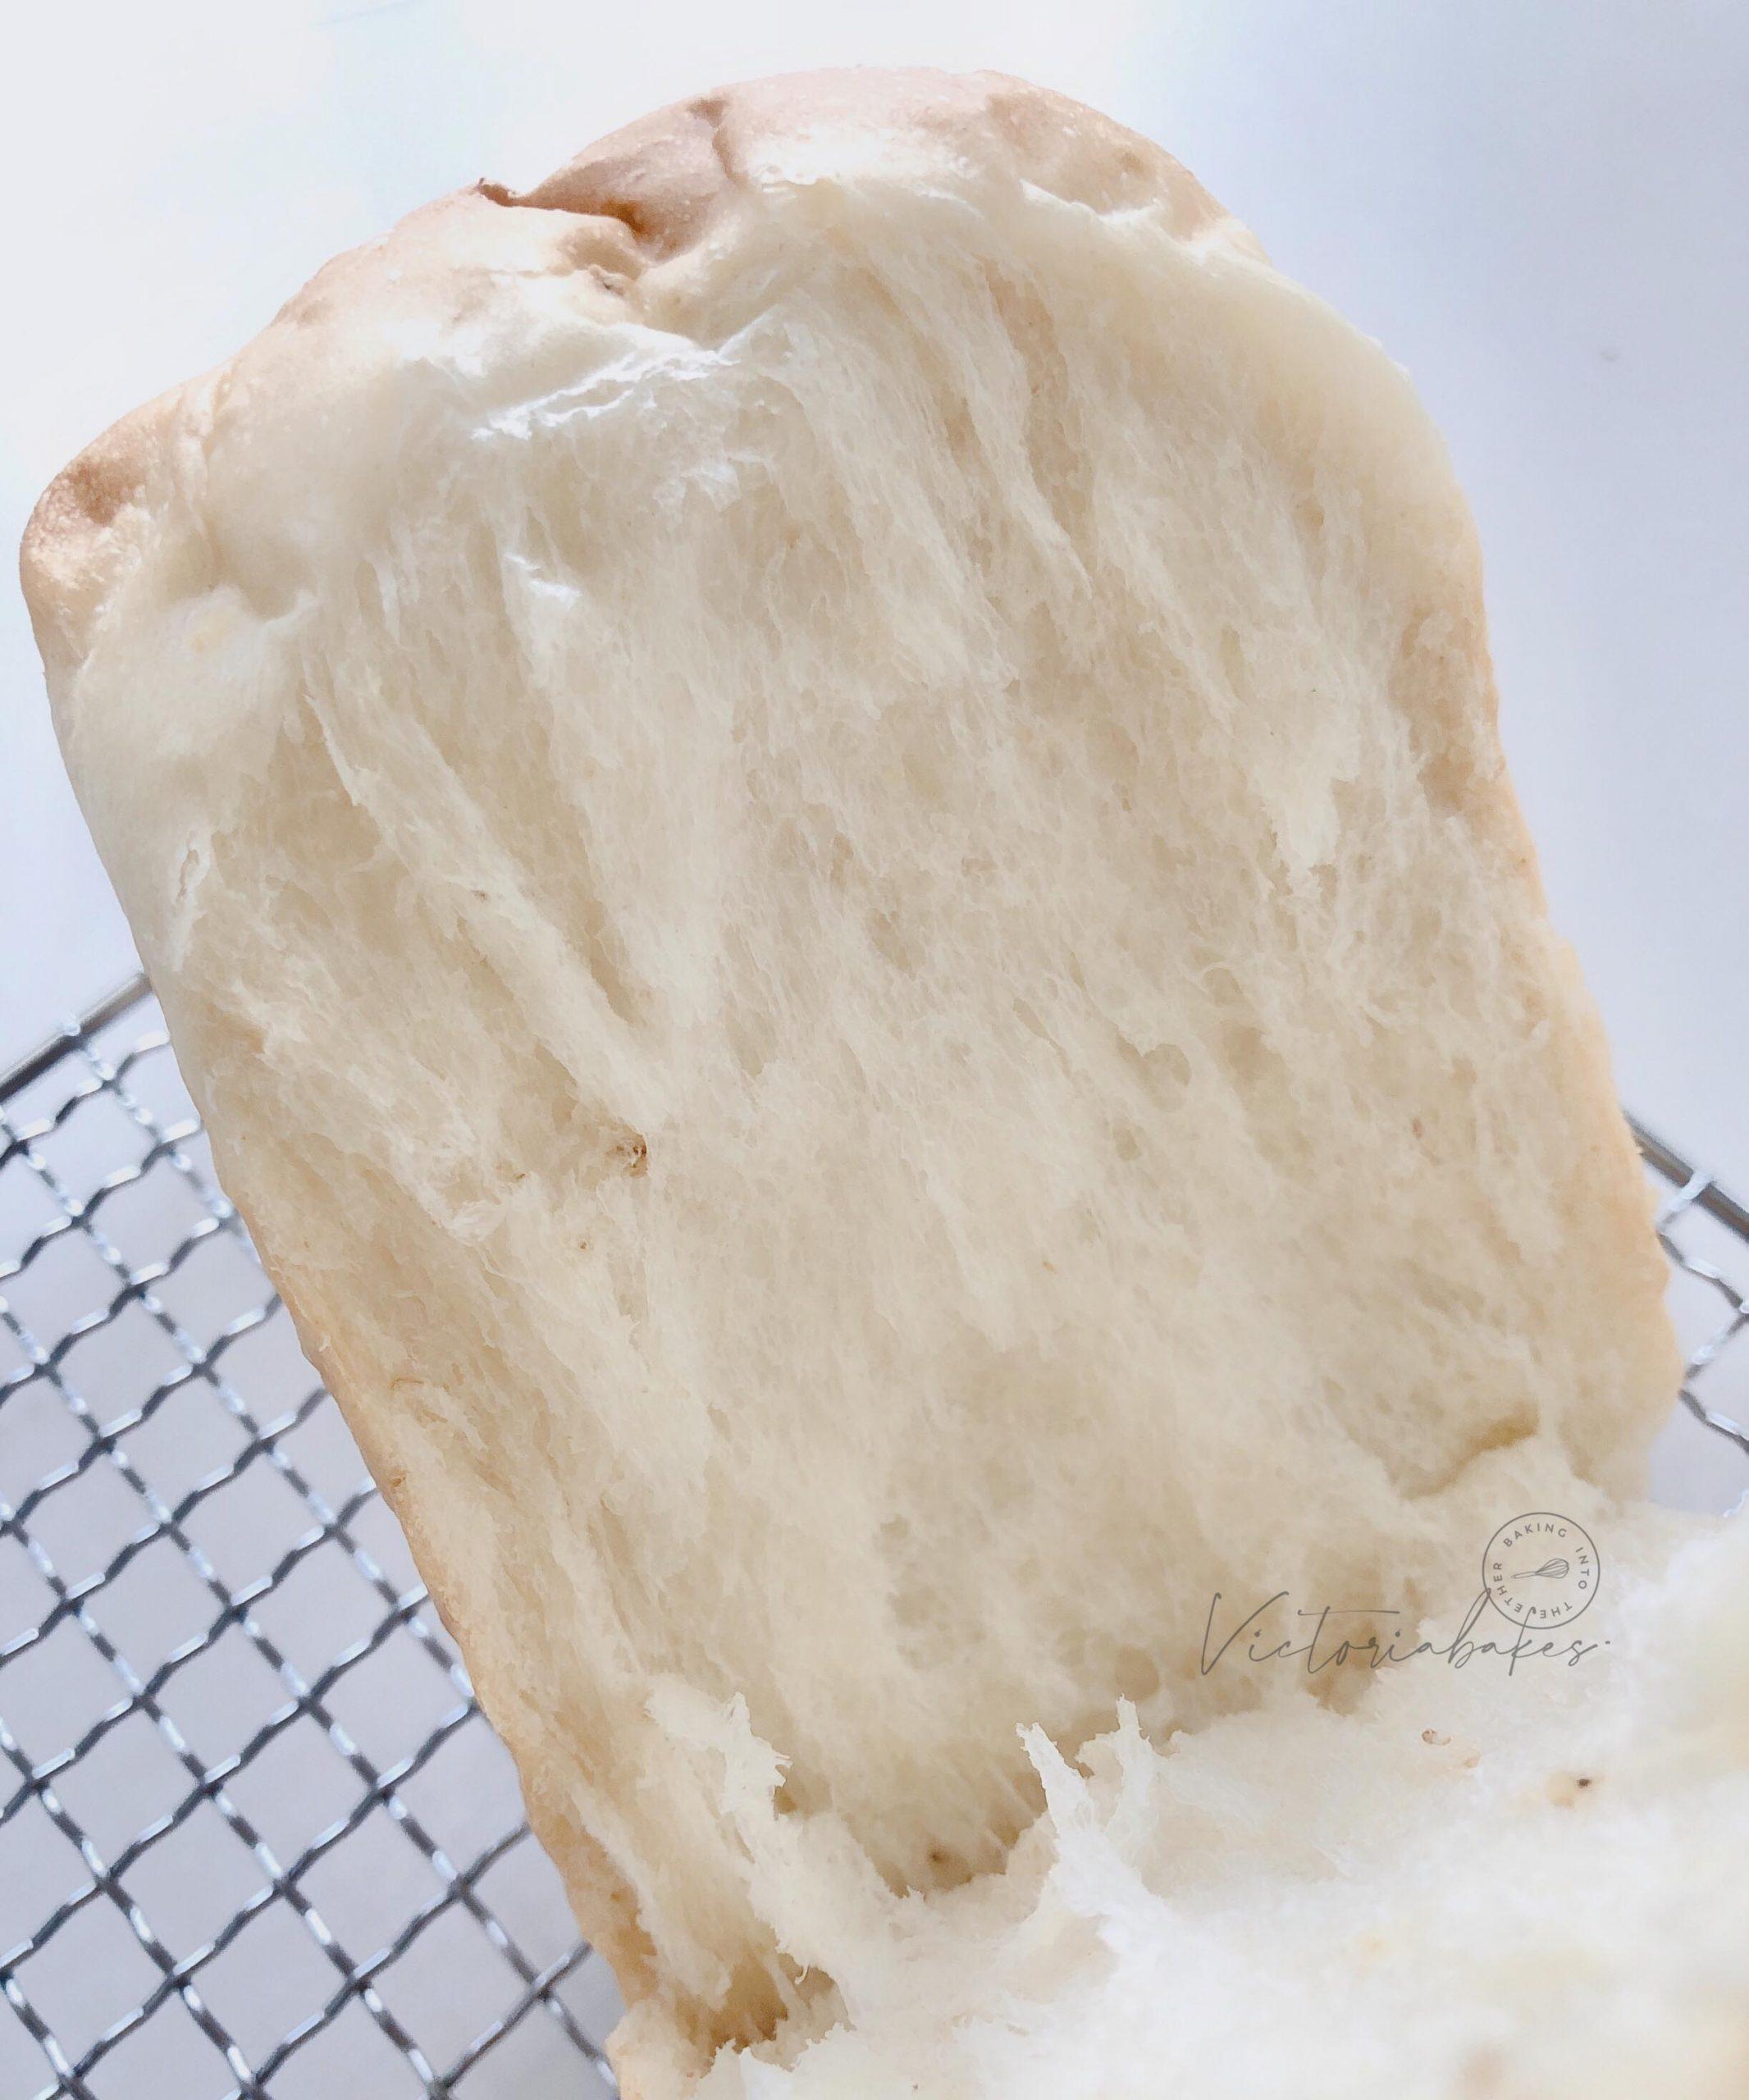 angel toast (no butter/oil) & shaping sticky dough (video) ~ highly recommended 天使无油吐司 . 粘手的面团如何整形 (附视频)~ 强推